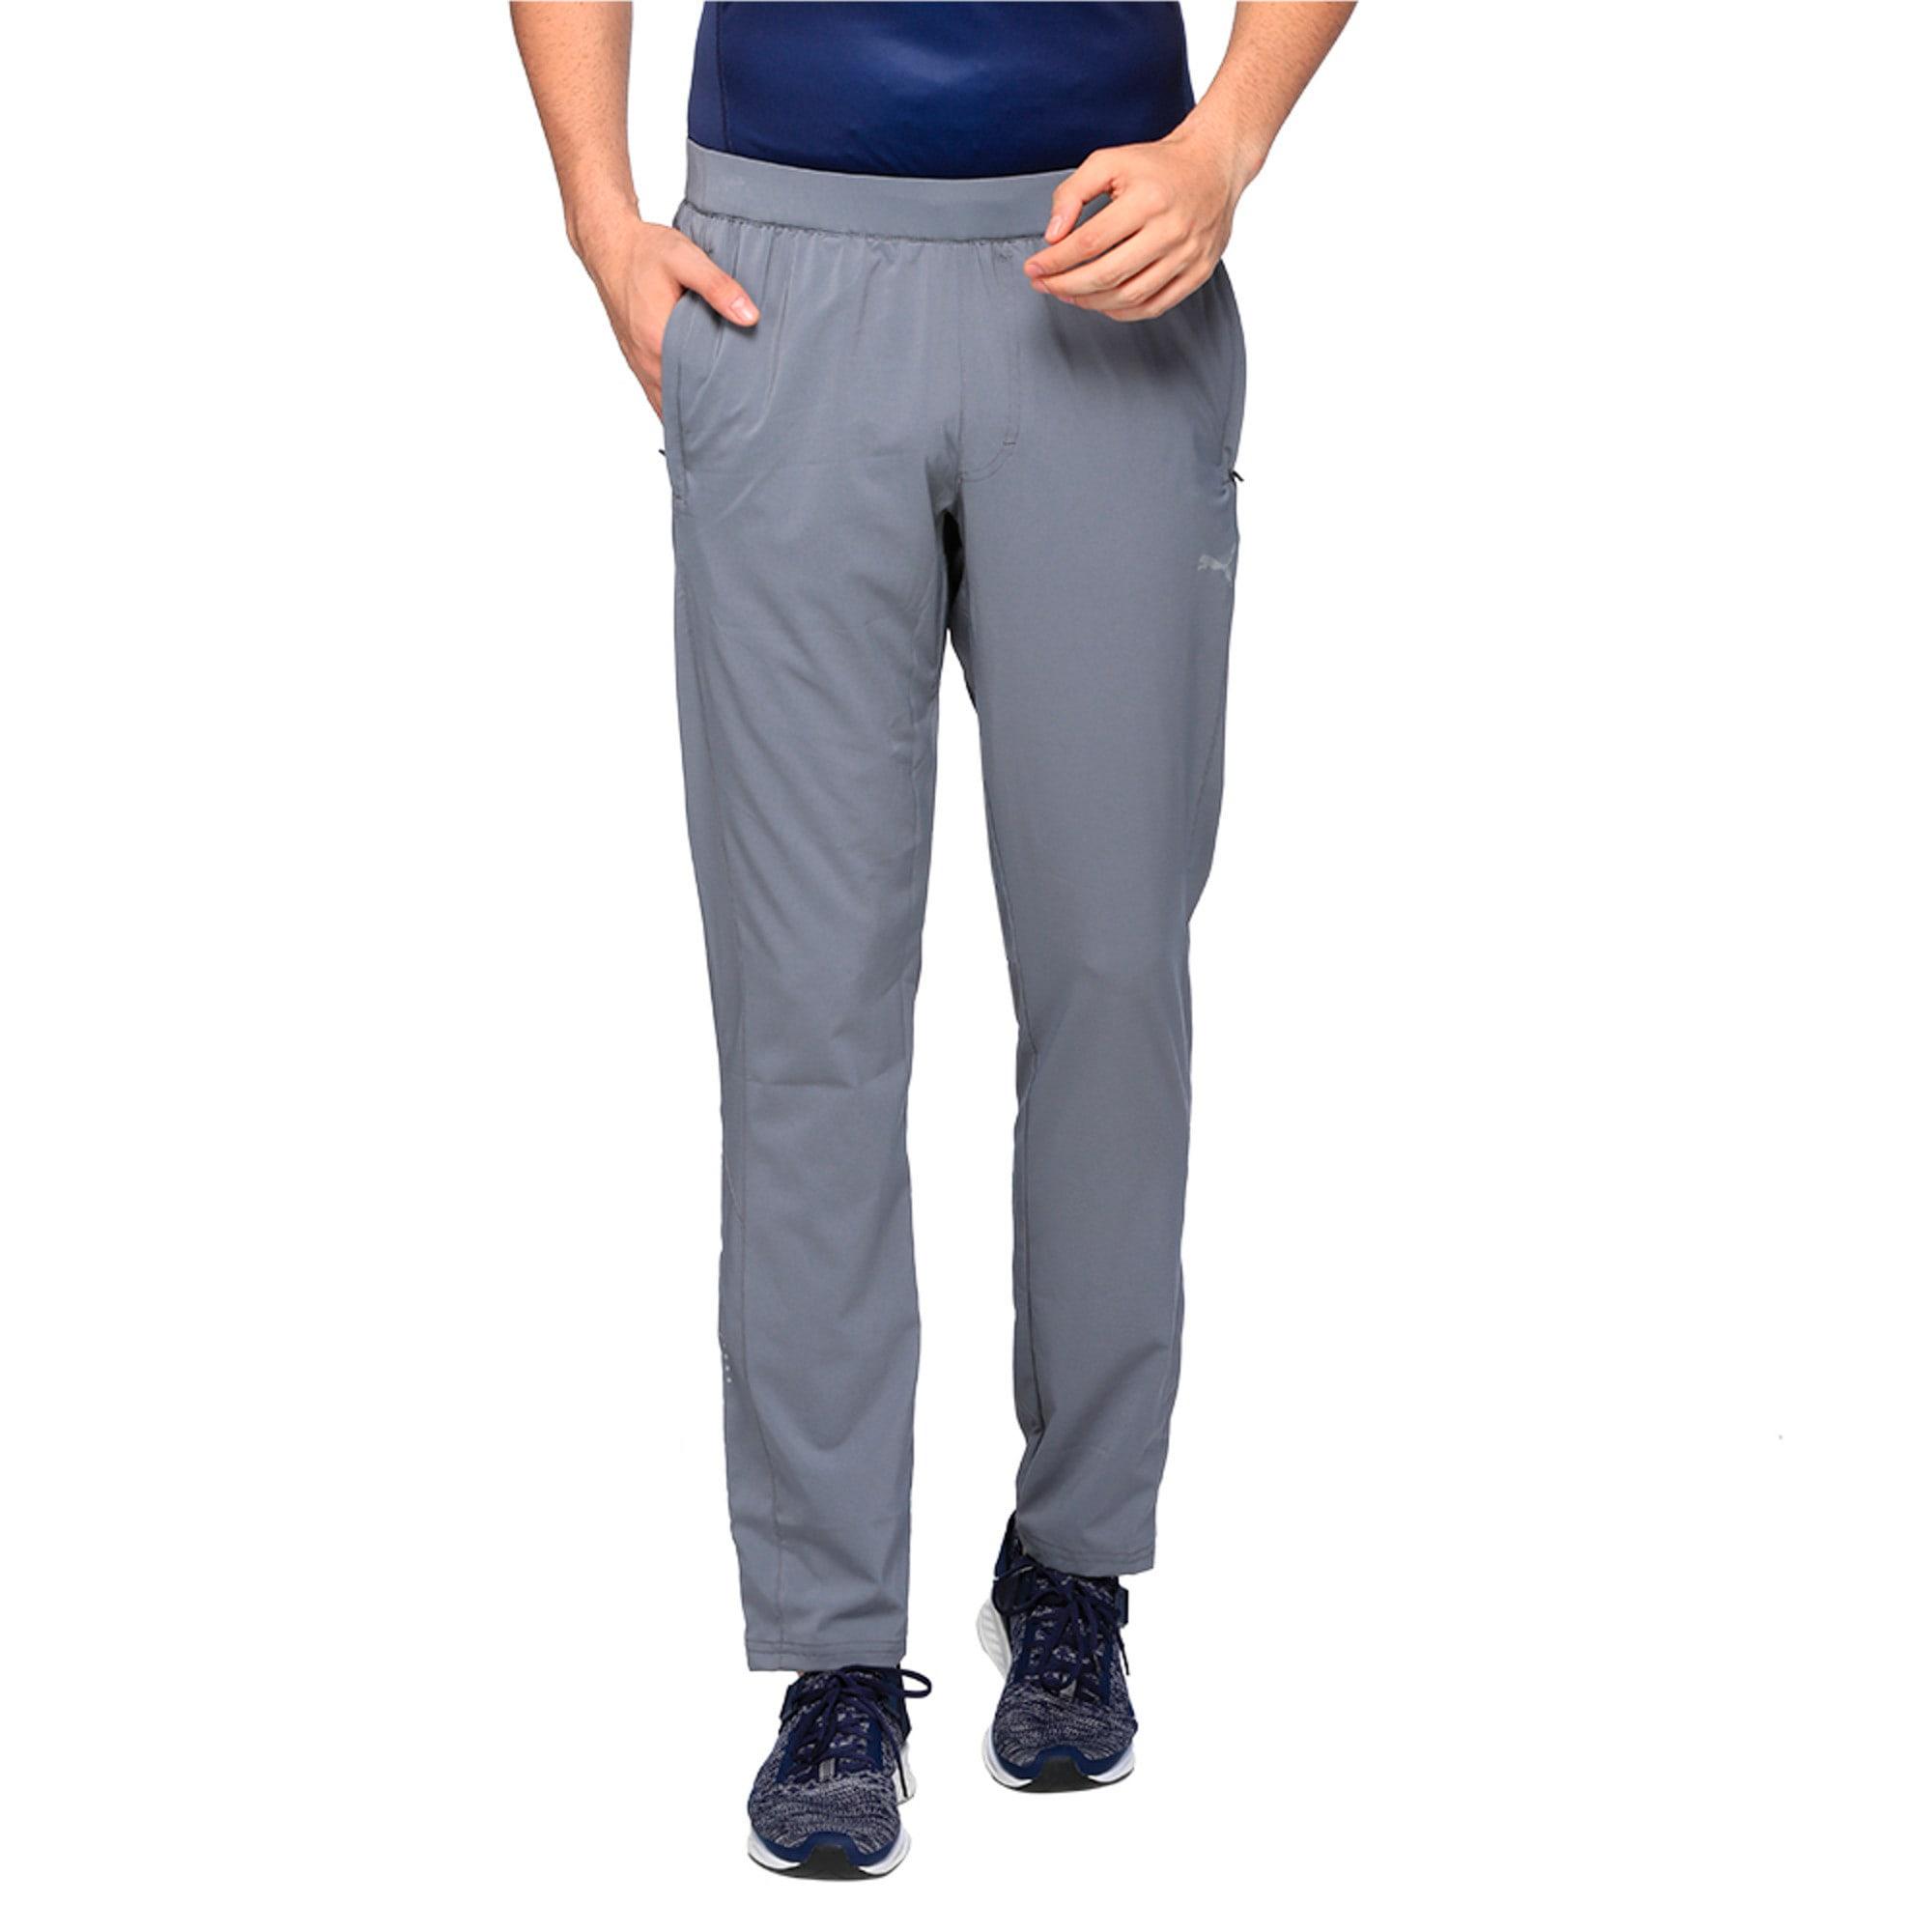 Thumbnail 1 of Running Men's Tapered Pants, QUIET SHADE, medium-IND